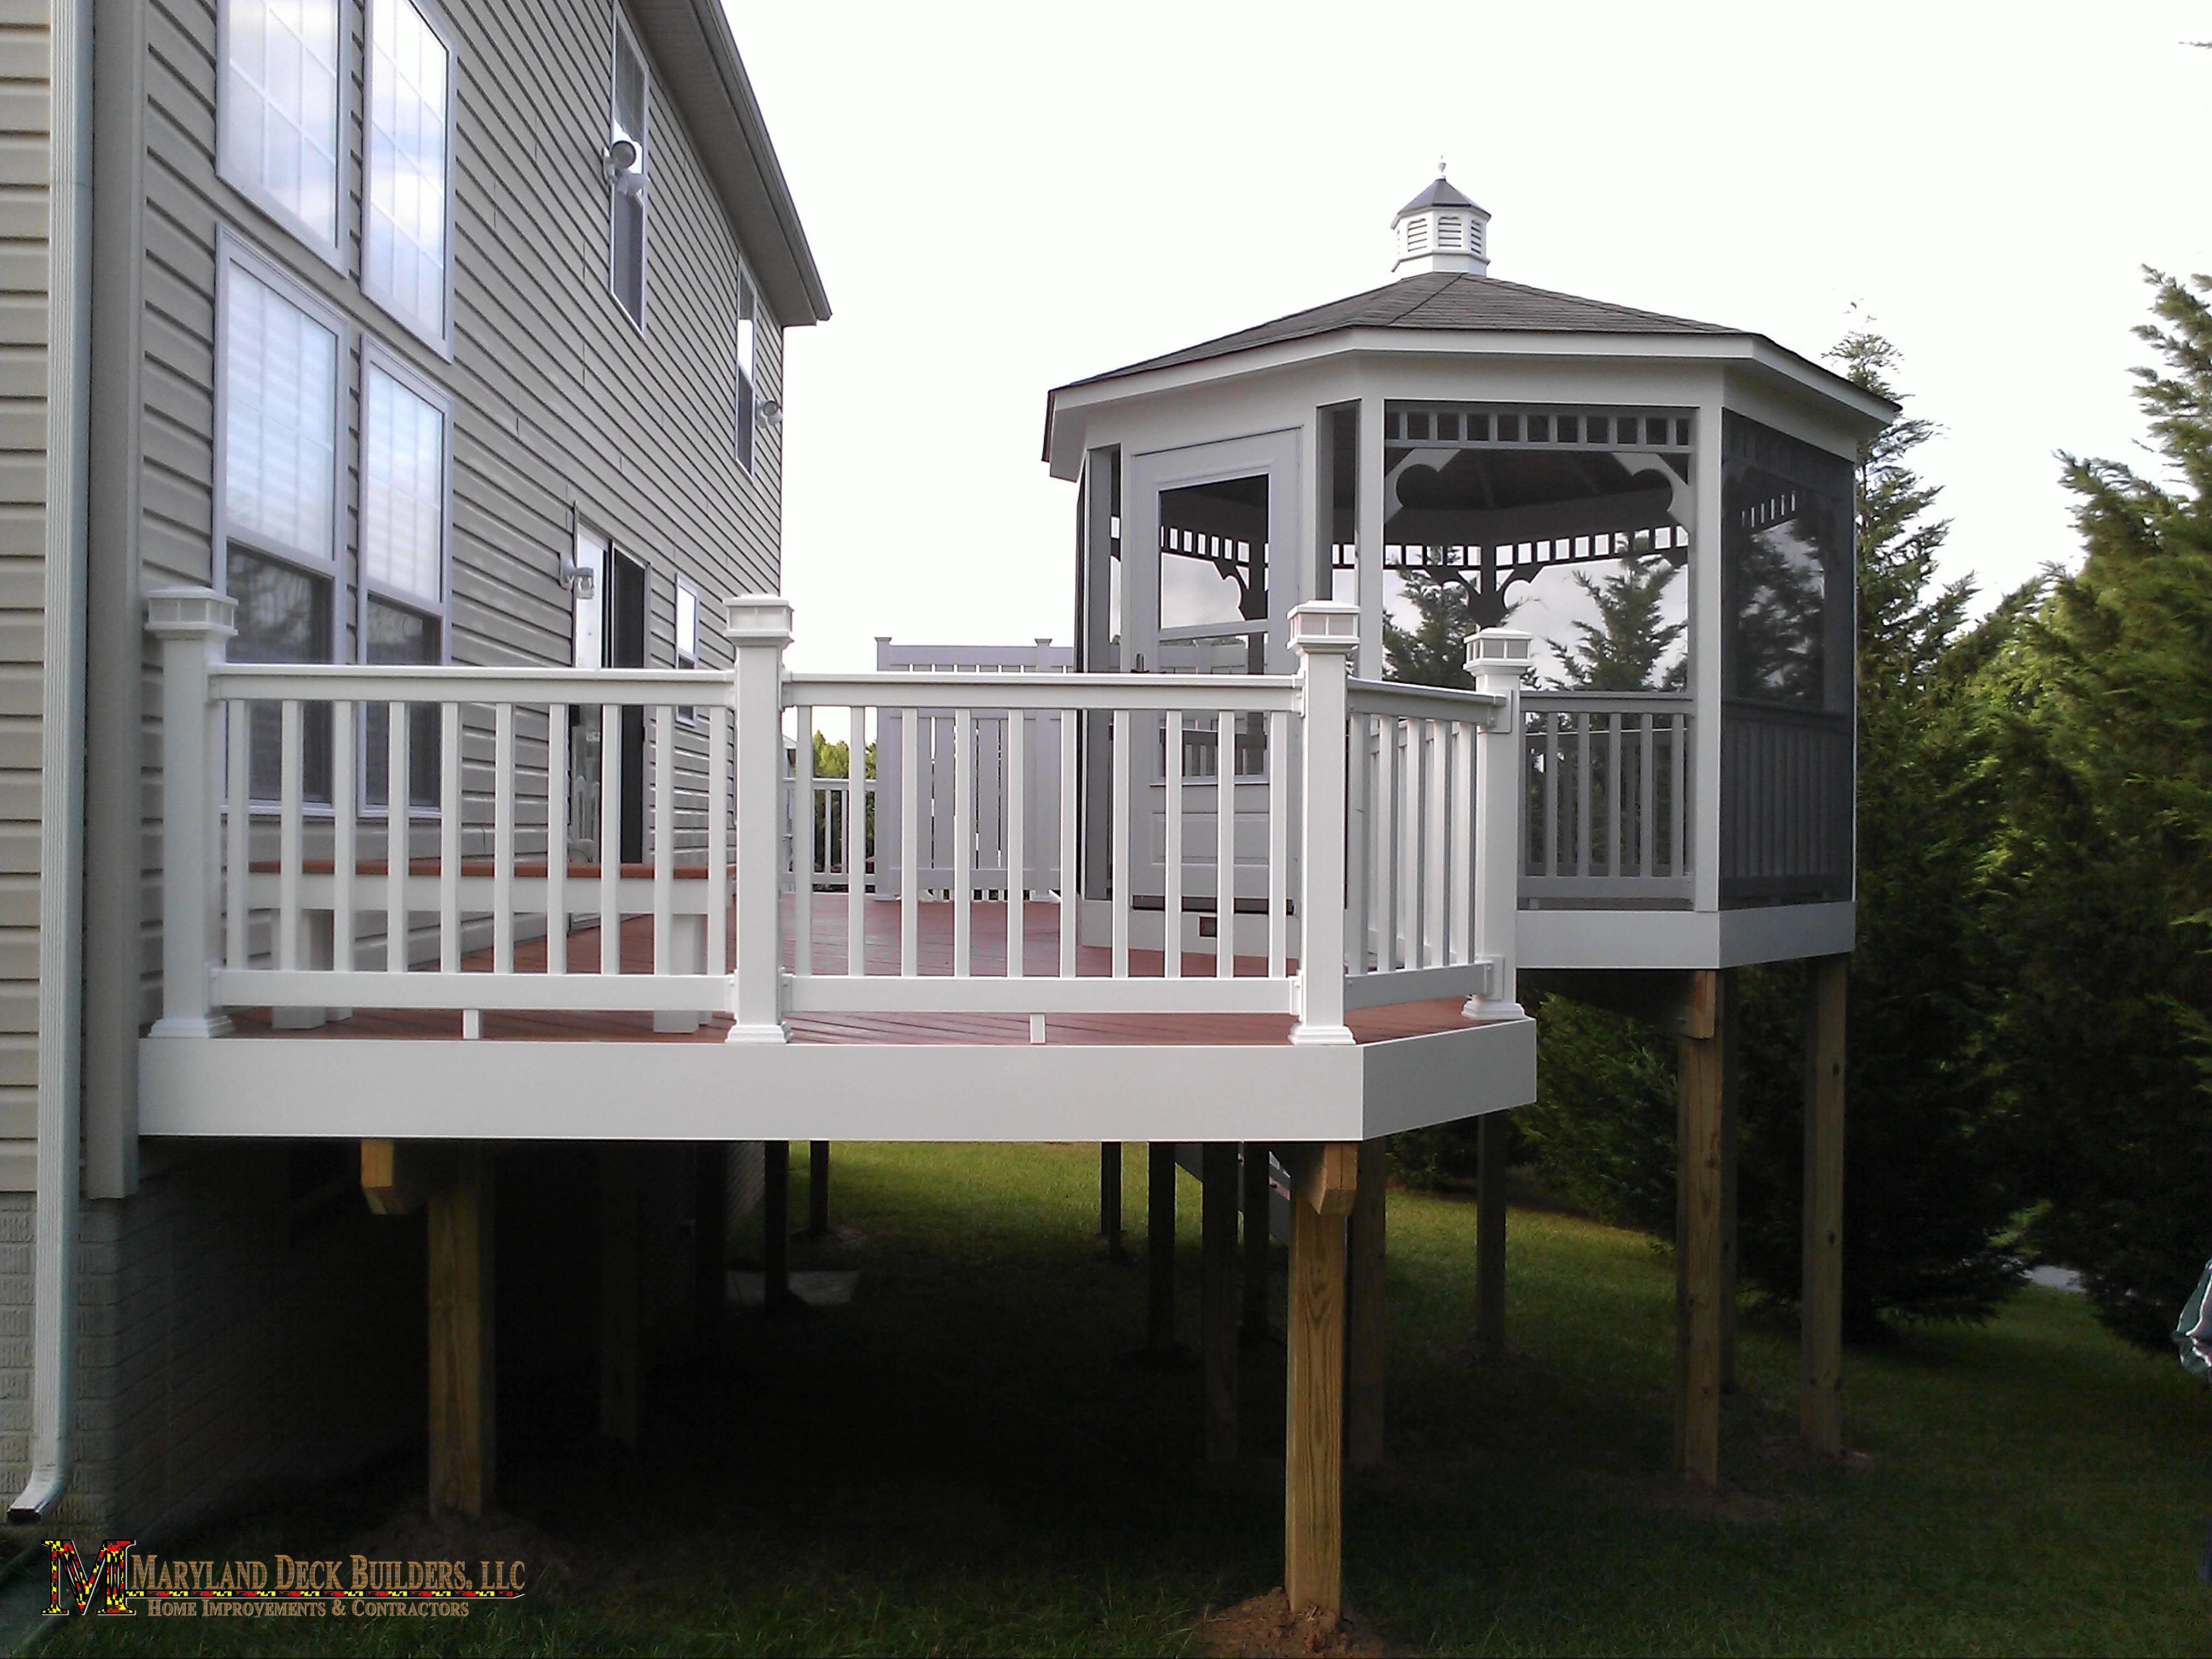 Maryland Deck Builders Llc L Md Decks I Porches I Fences